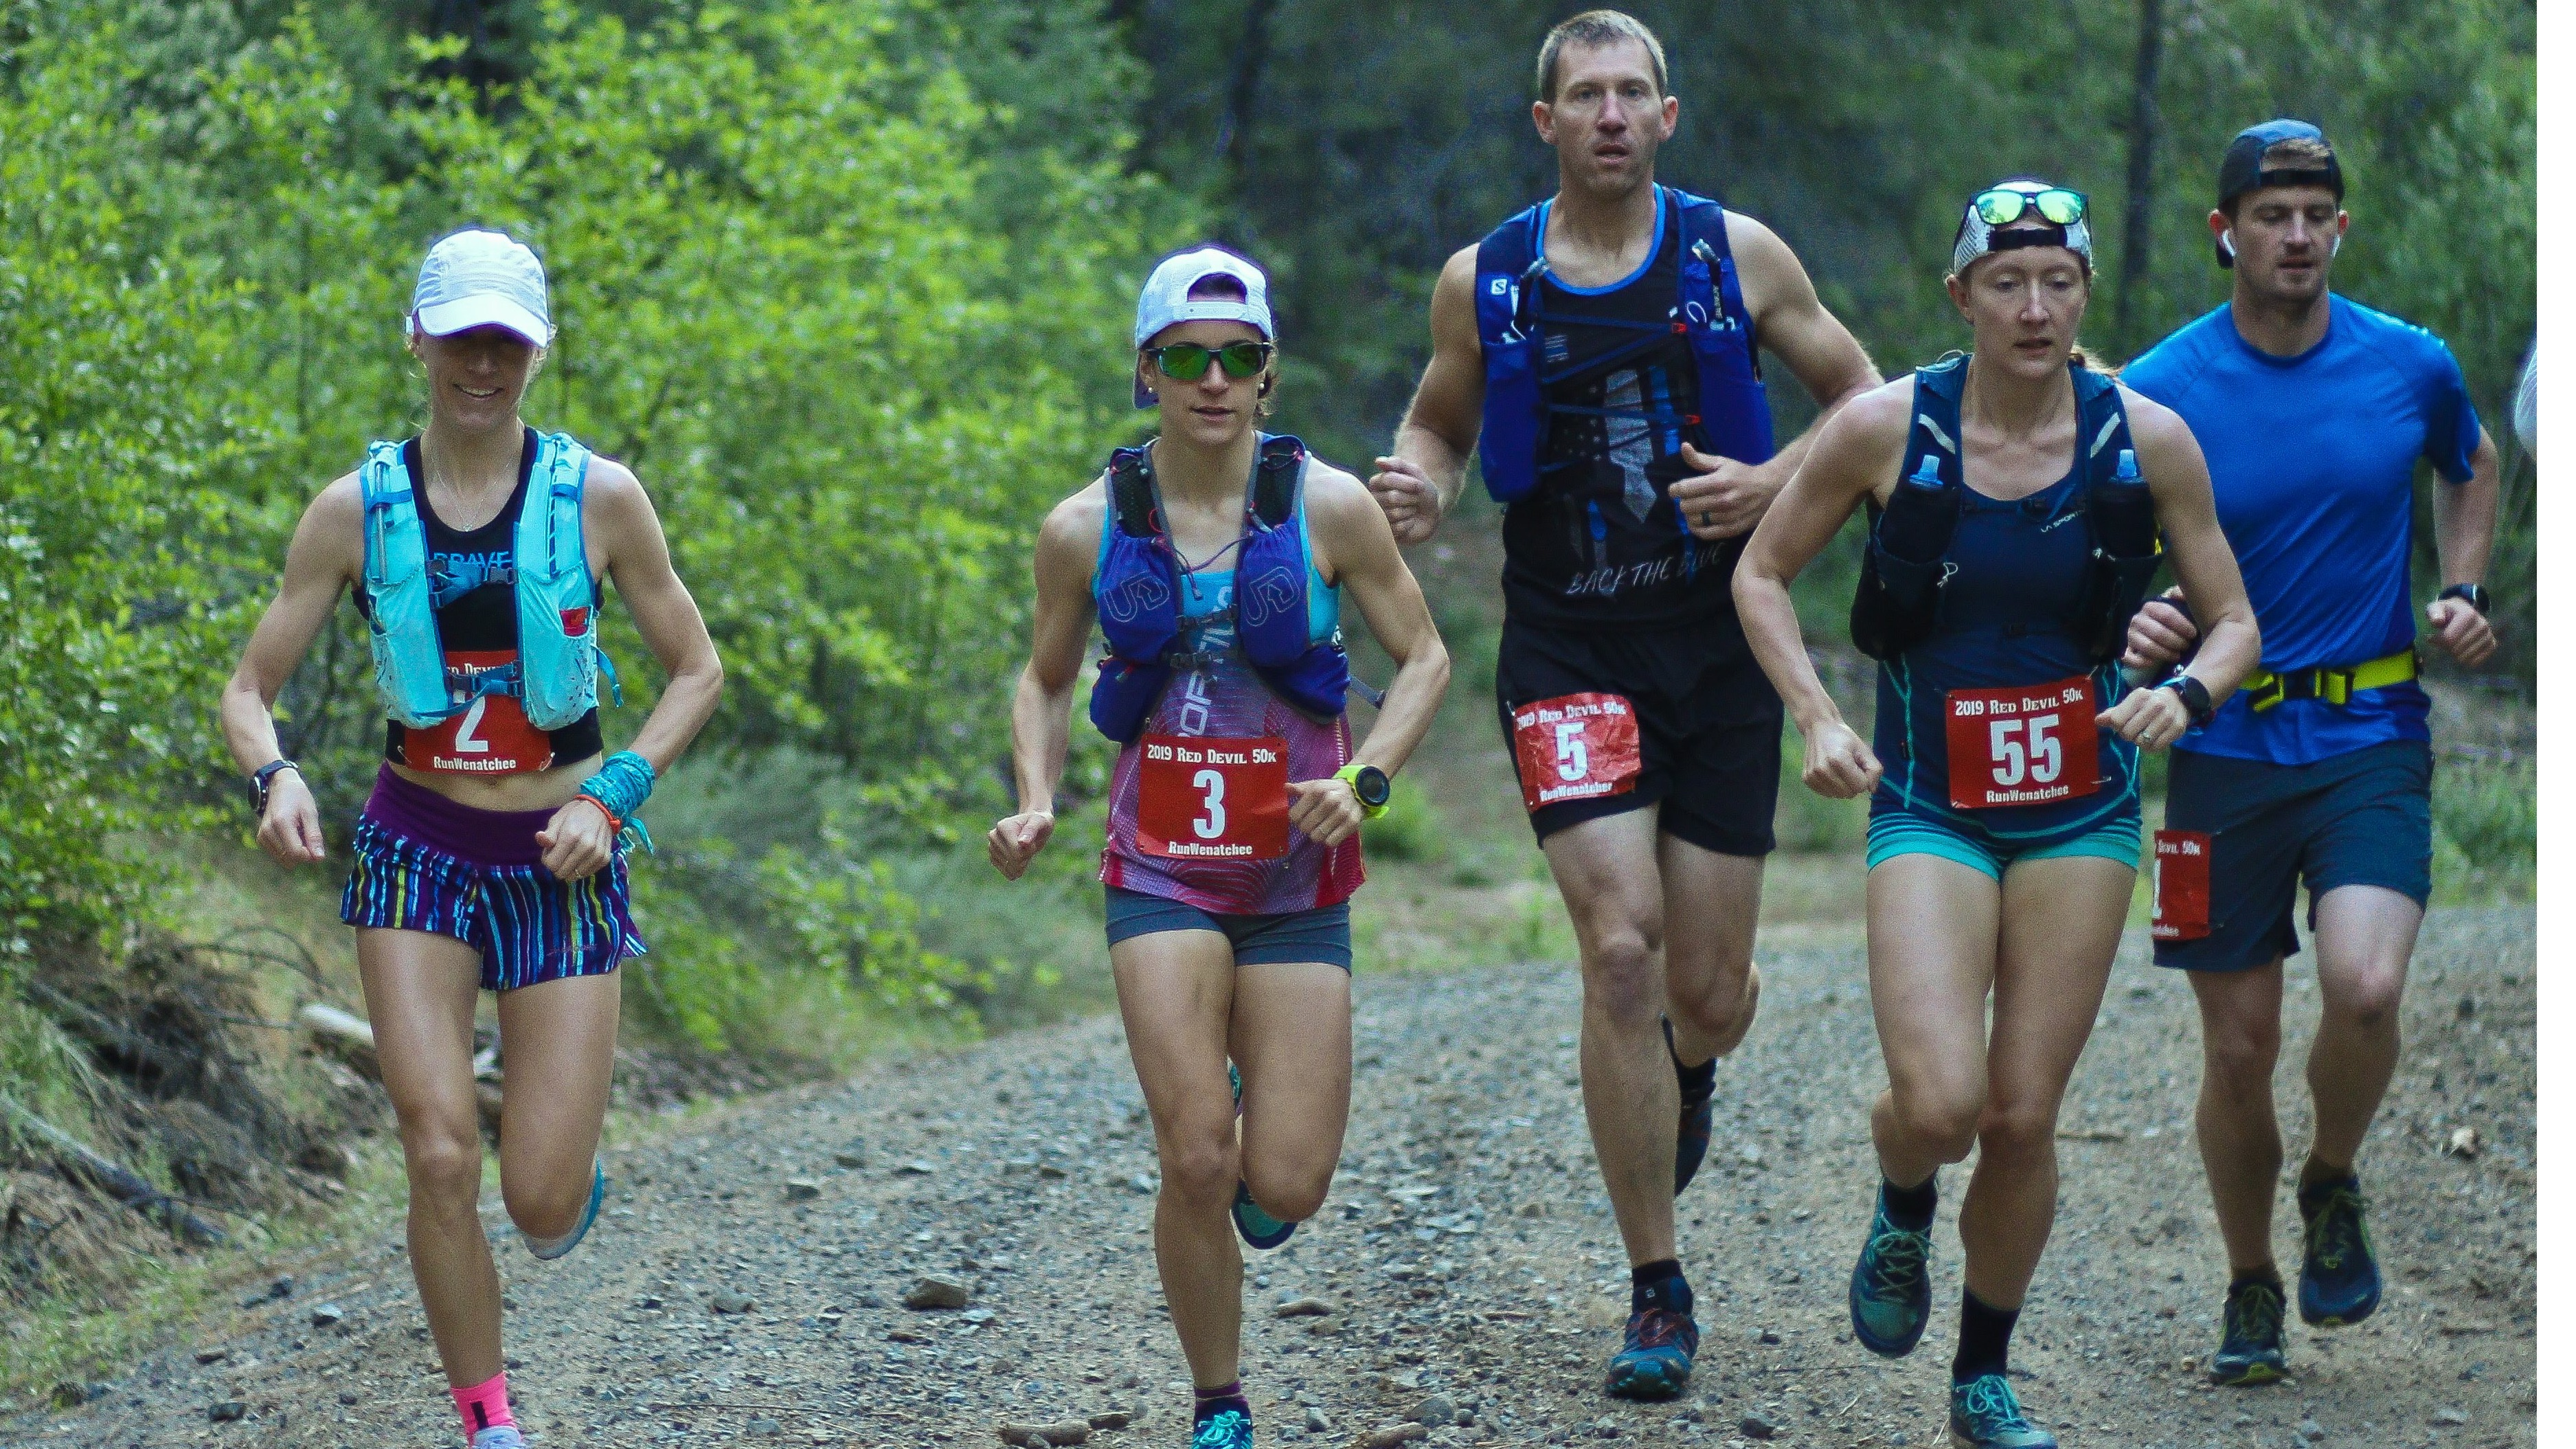 Red Devil Trail Runs 50k/25k/10k